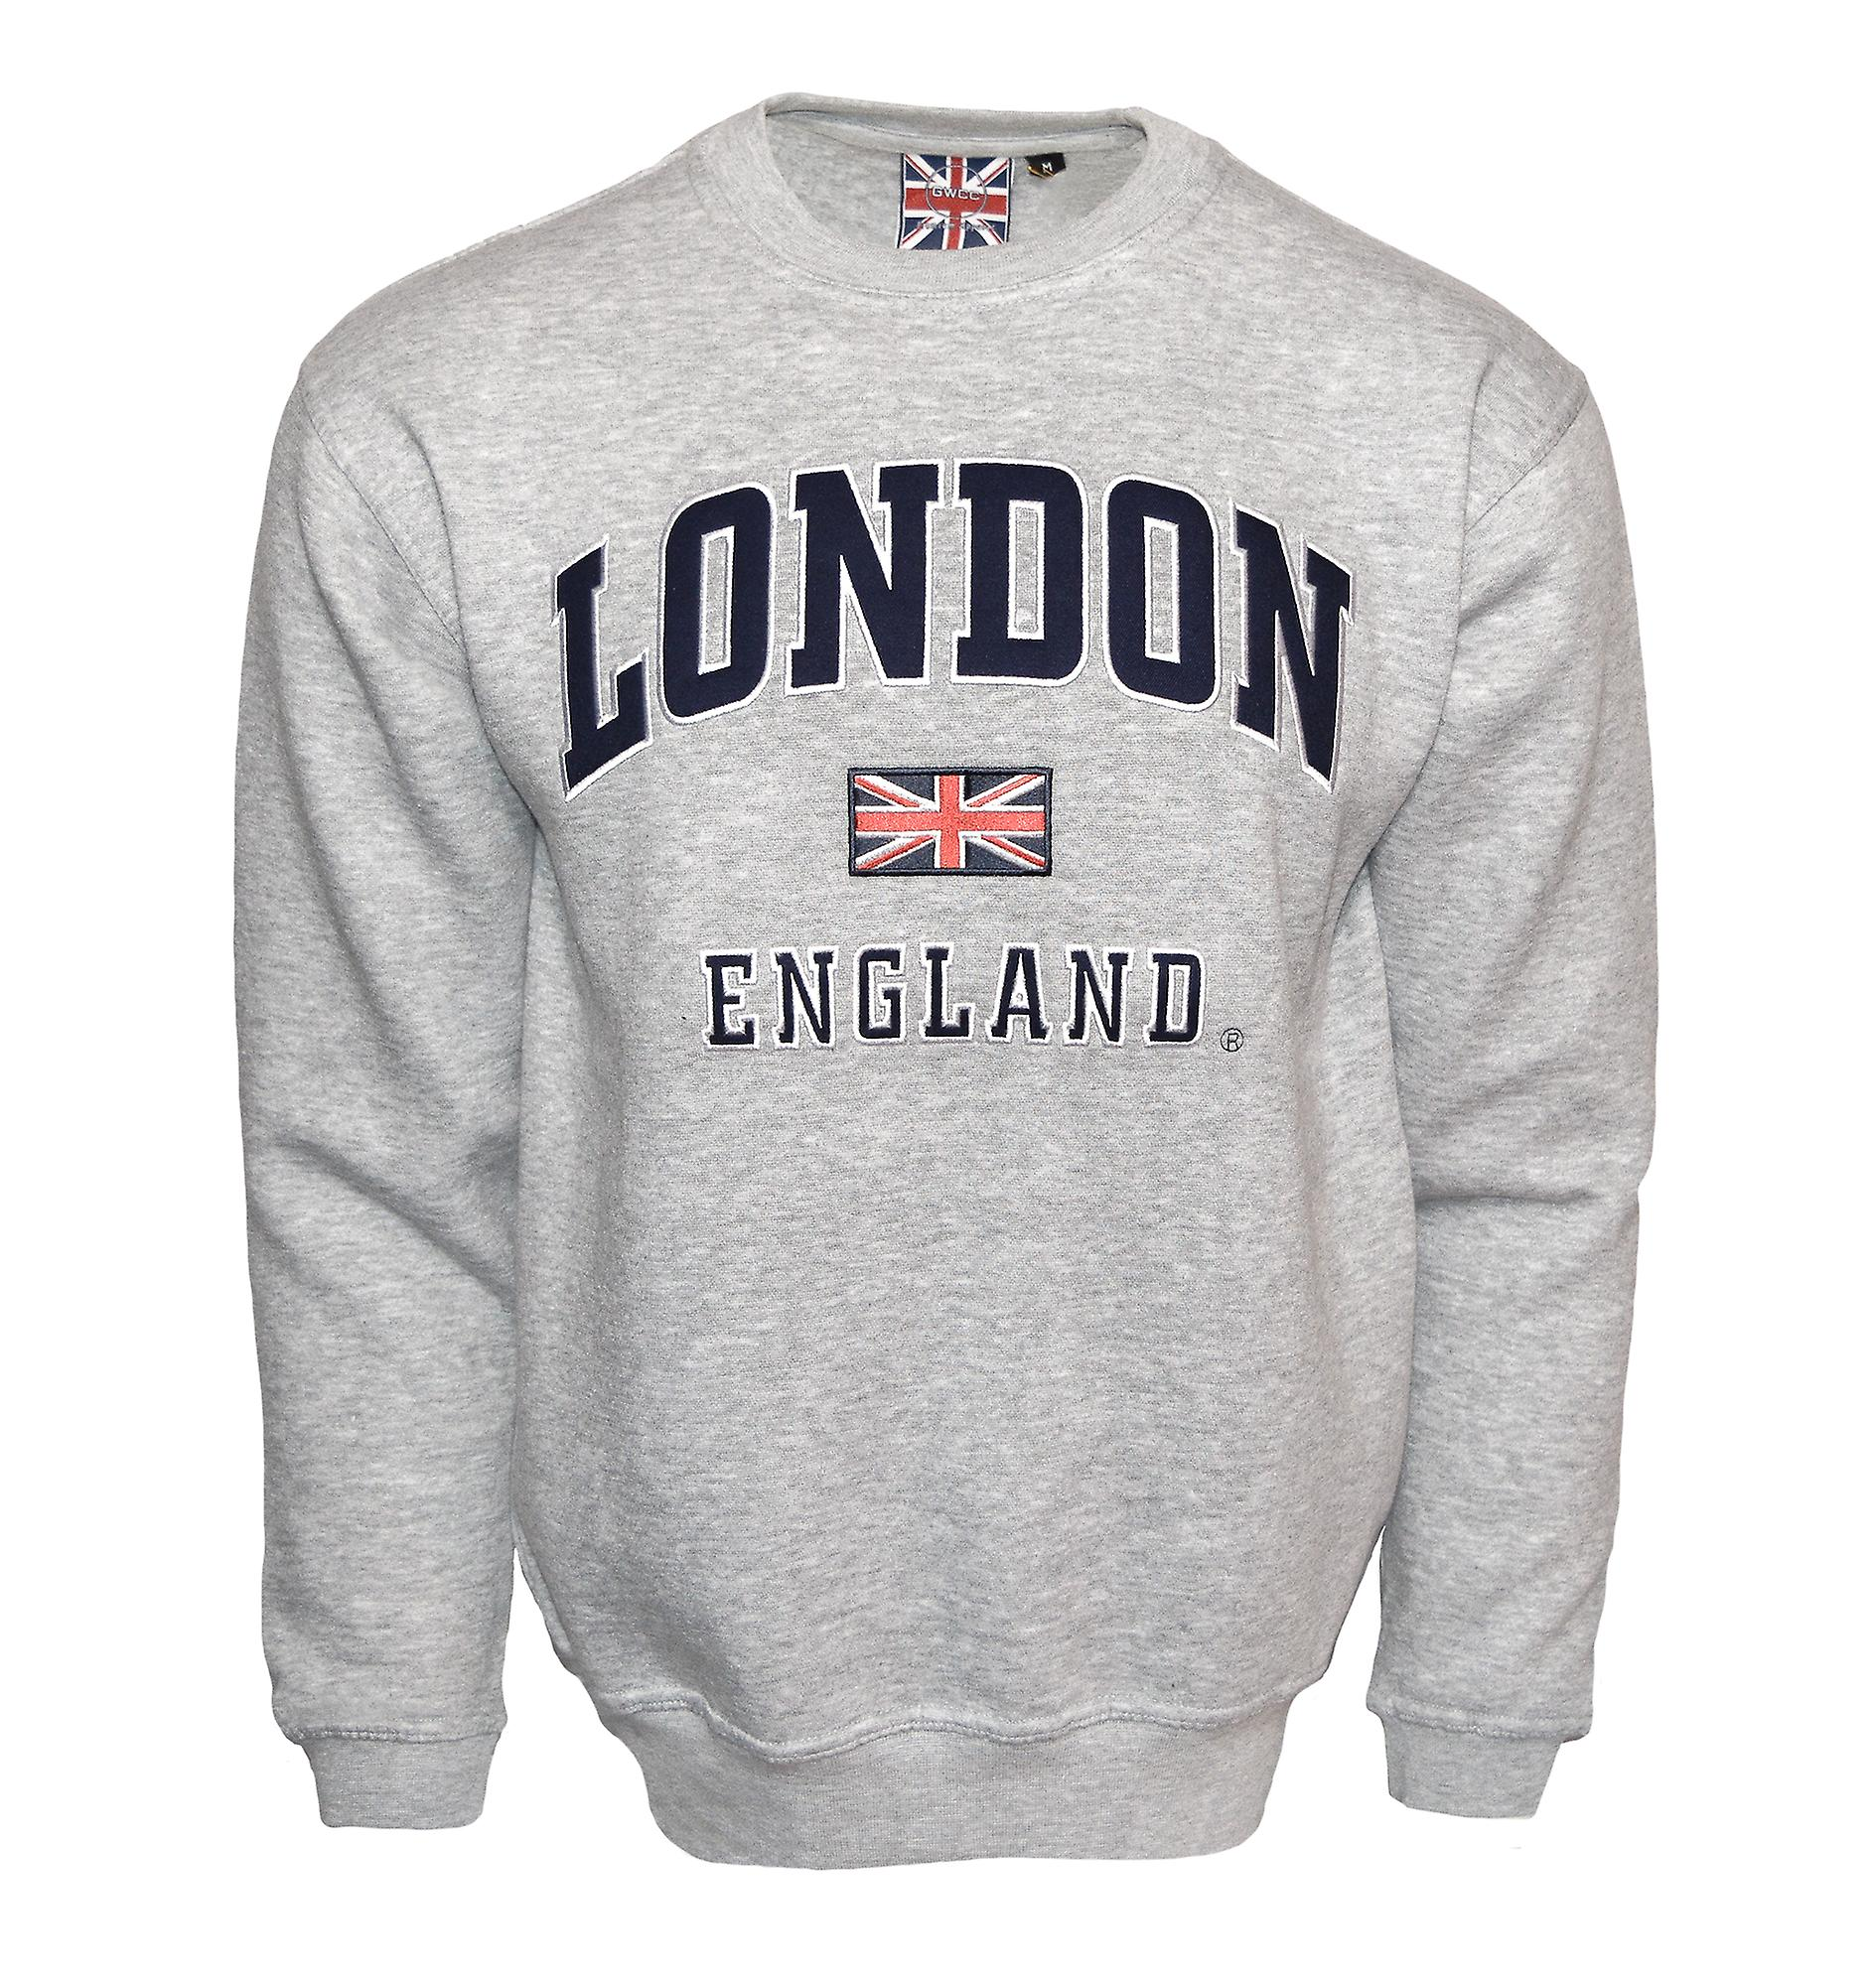 Le201gn unisex london england sweatshirt grey navy xs-2xl